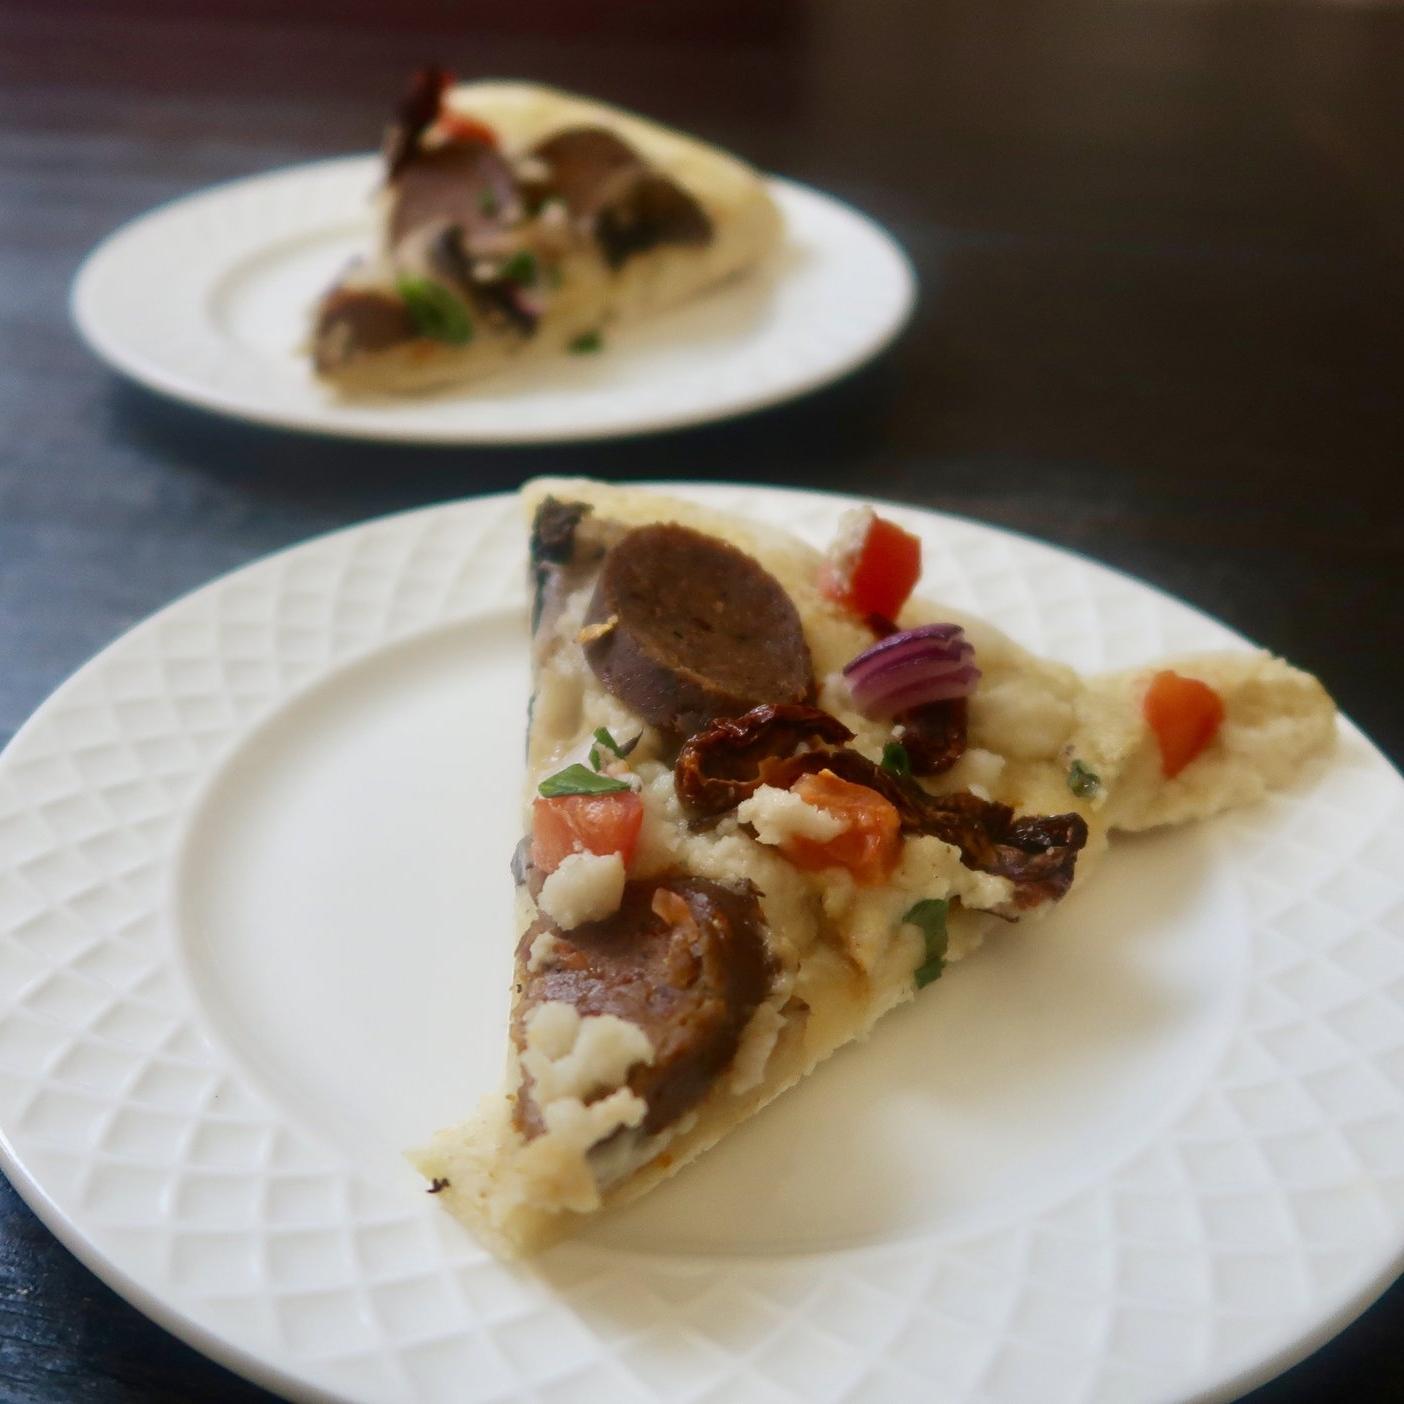 Vegan Garlic Alfredo Pizza  https://www.kristancbarril.com/blog-1/recipes/2018/10/22/garlic-alfredo-pizza-with-tofurky-italian-sausages